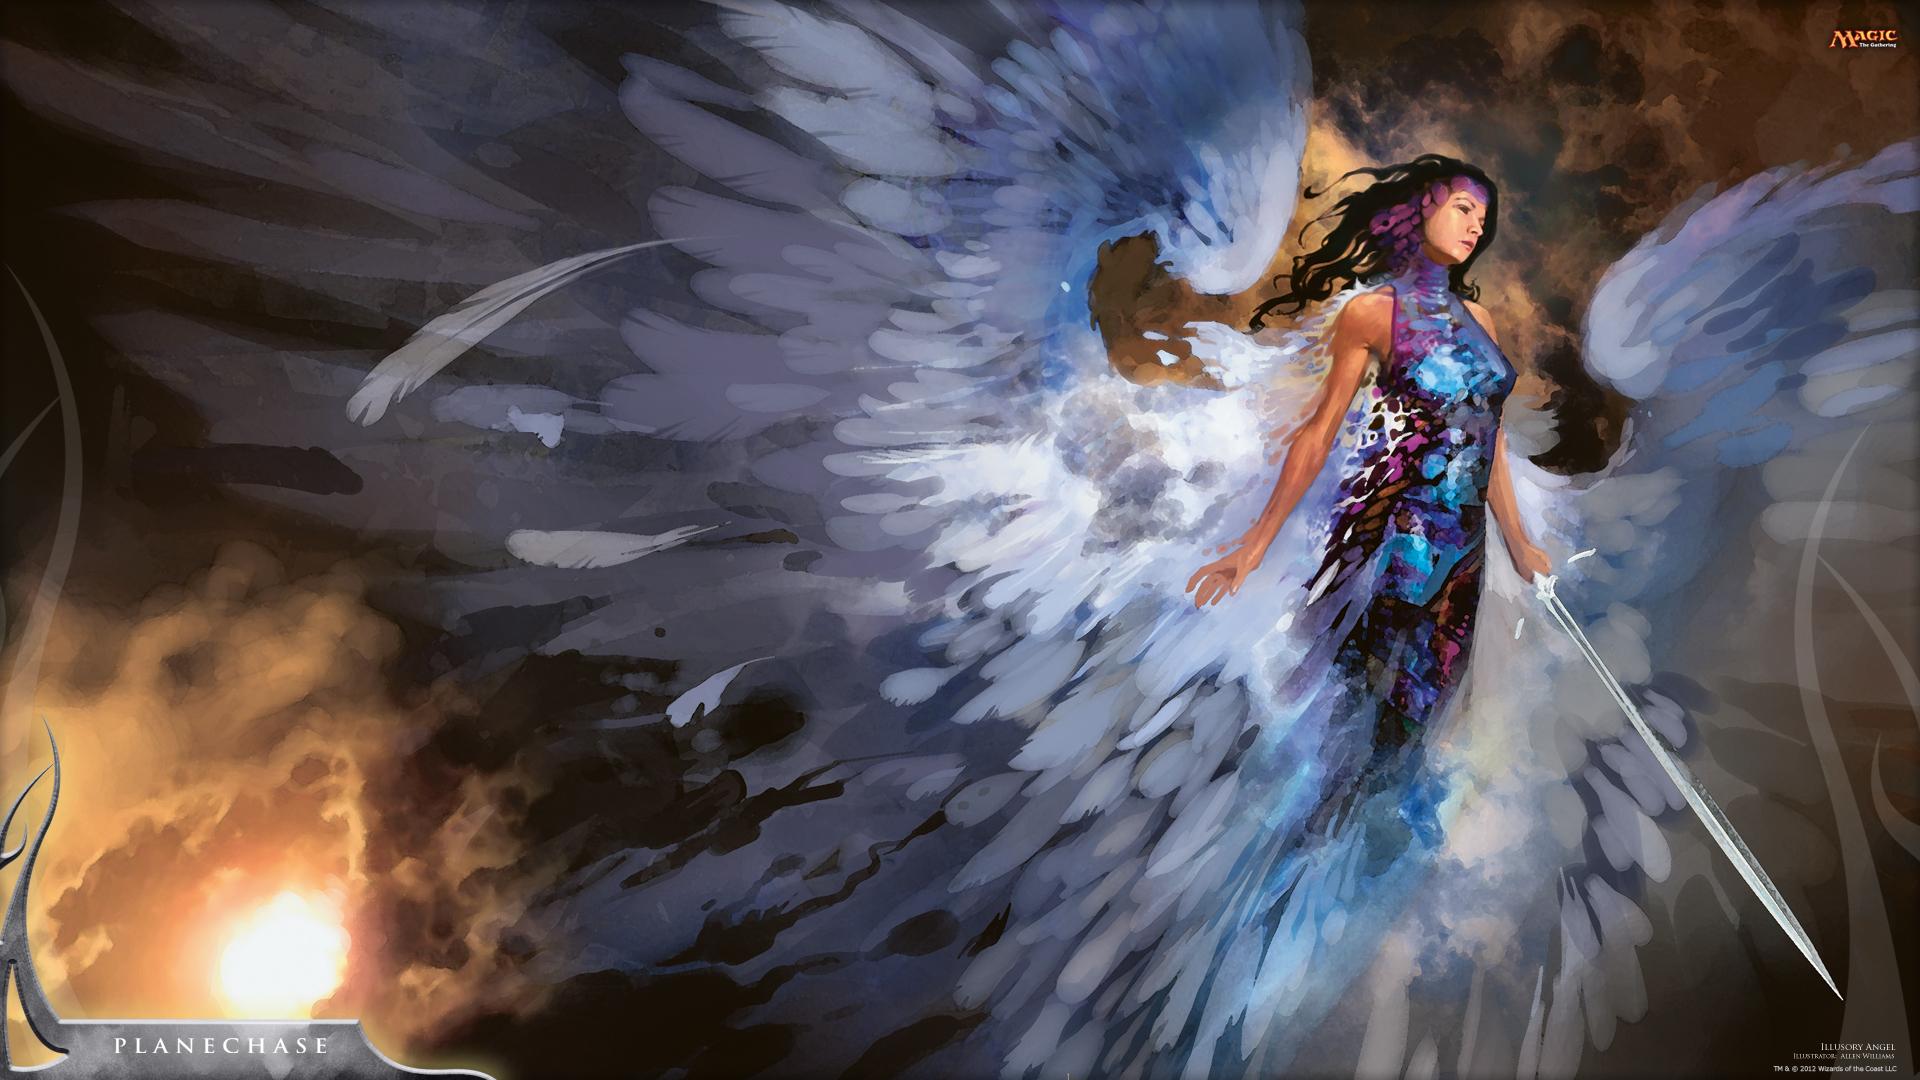 Artwork Fantasy Art Angel Wallpapers Hd Desktop And: Wallpaper Of The Week: Illusory Angel